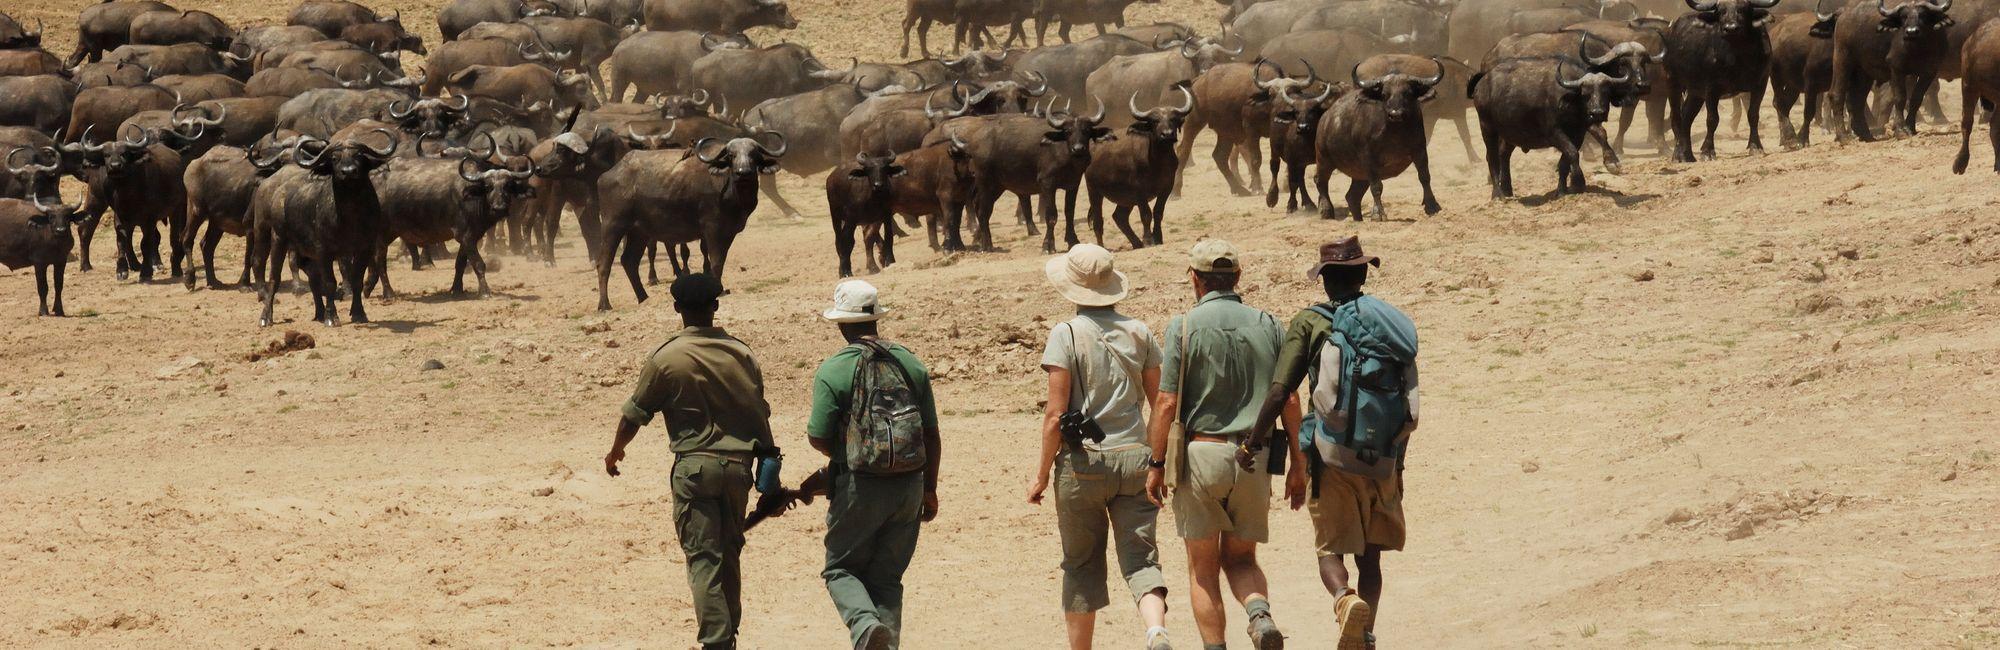 Home walking safari